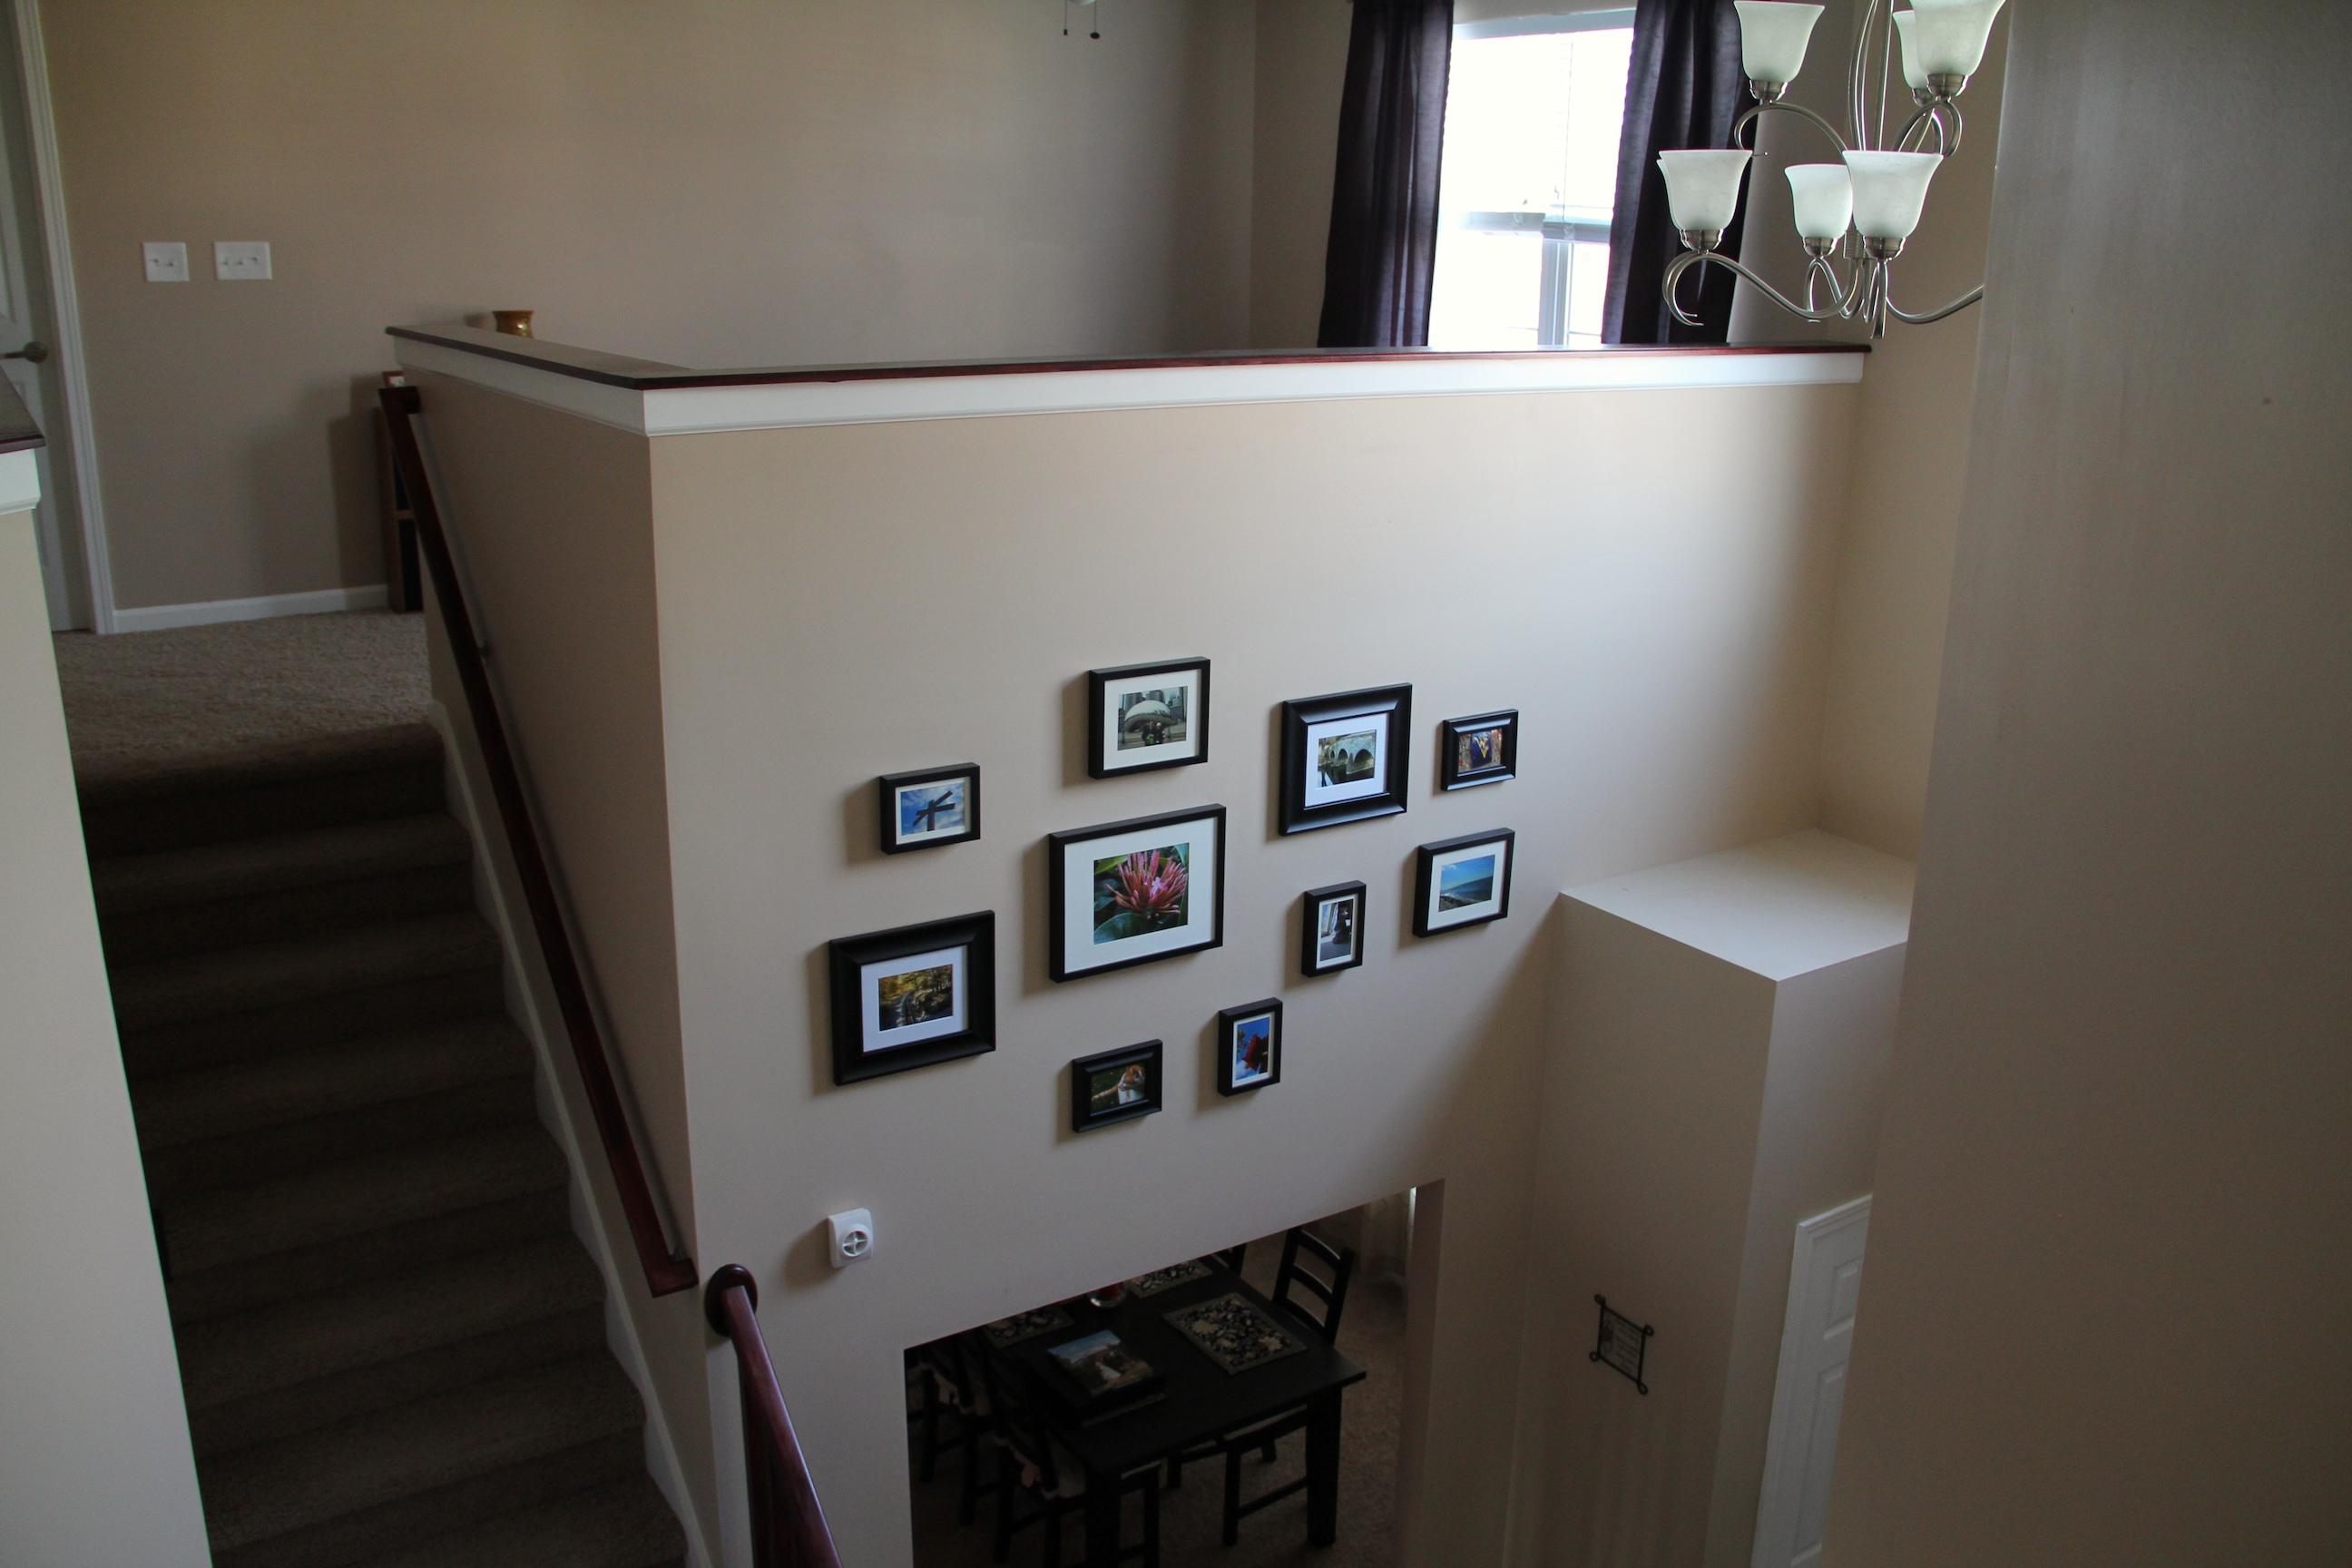 Arranging photos on a wall - Wall Art